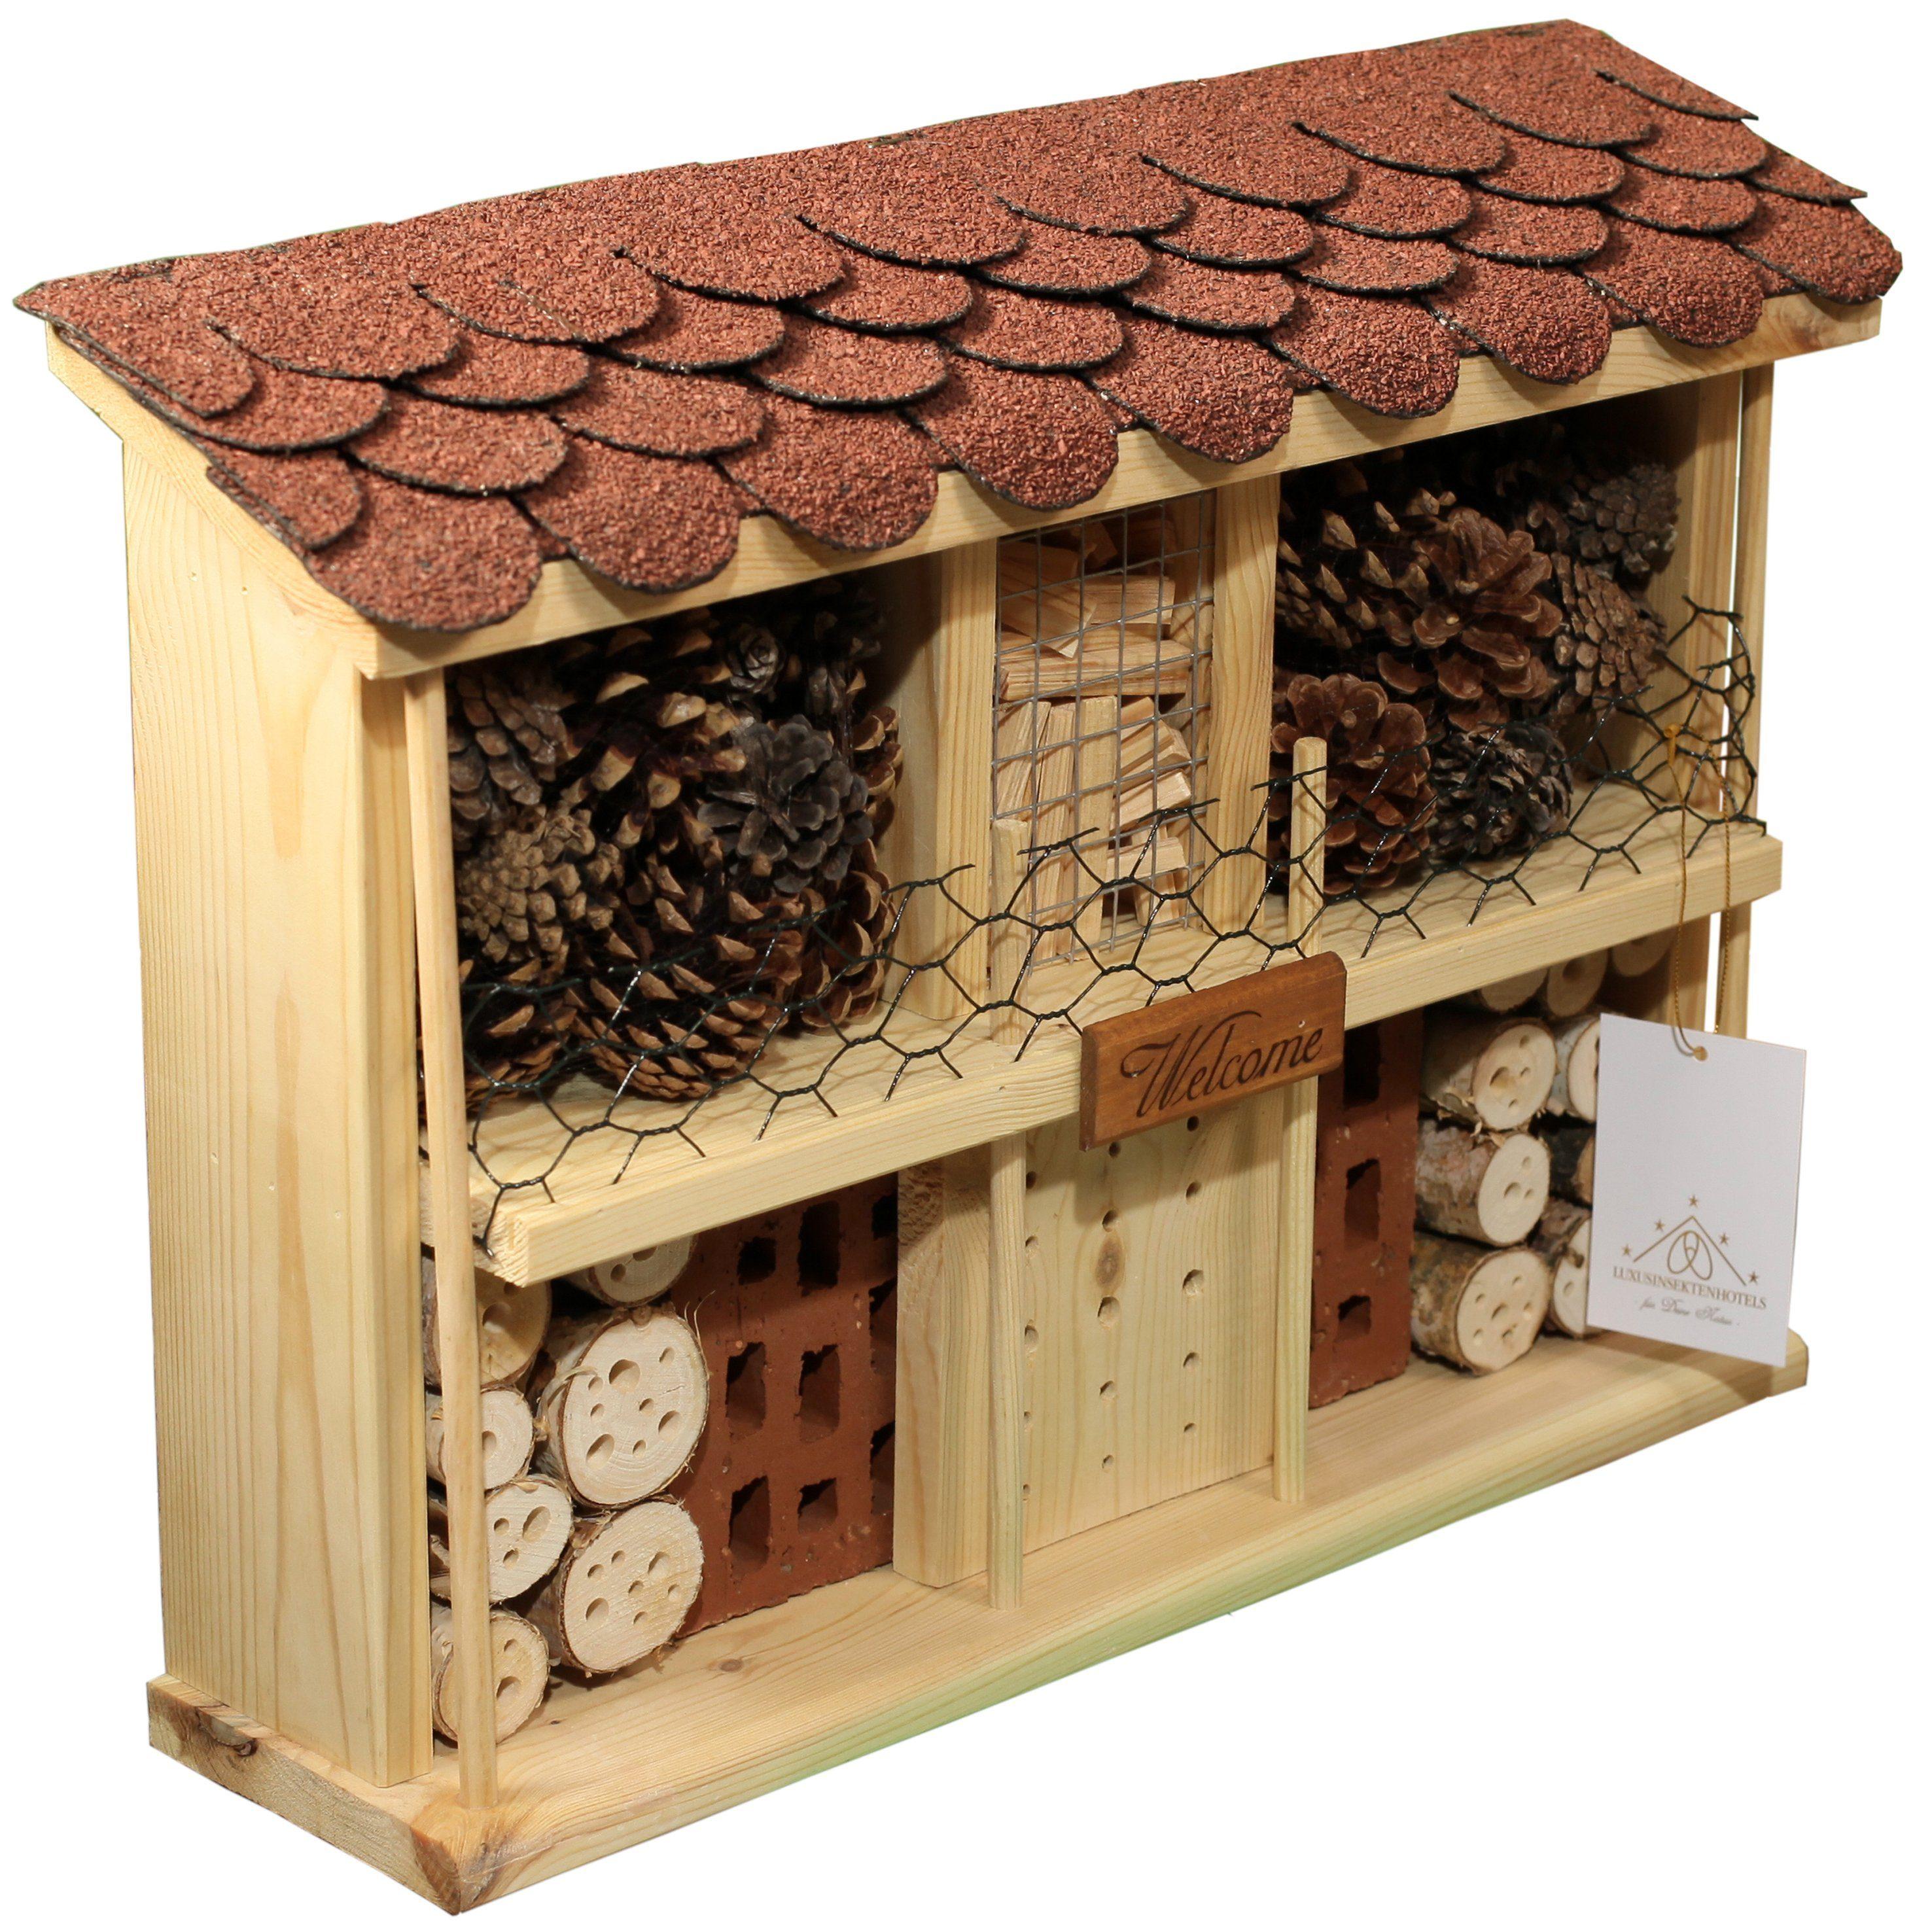 Luxusinsektenhotels Insektenhotel »Landhaus Komfort - Bausatz«